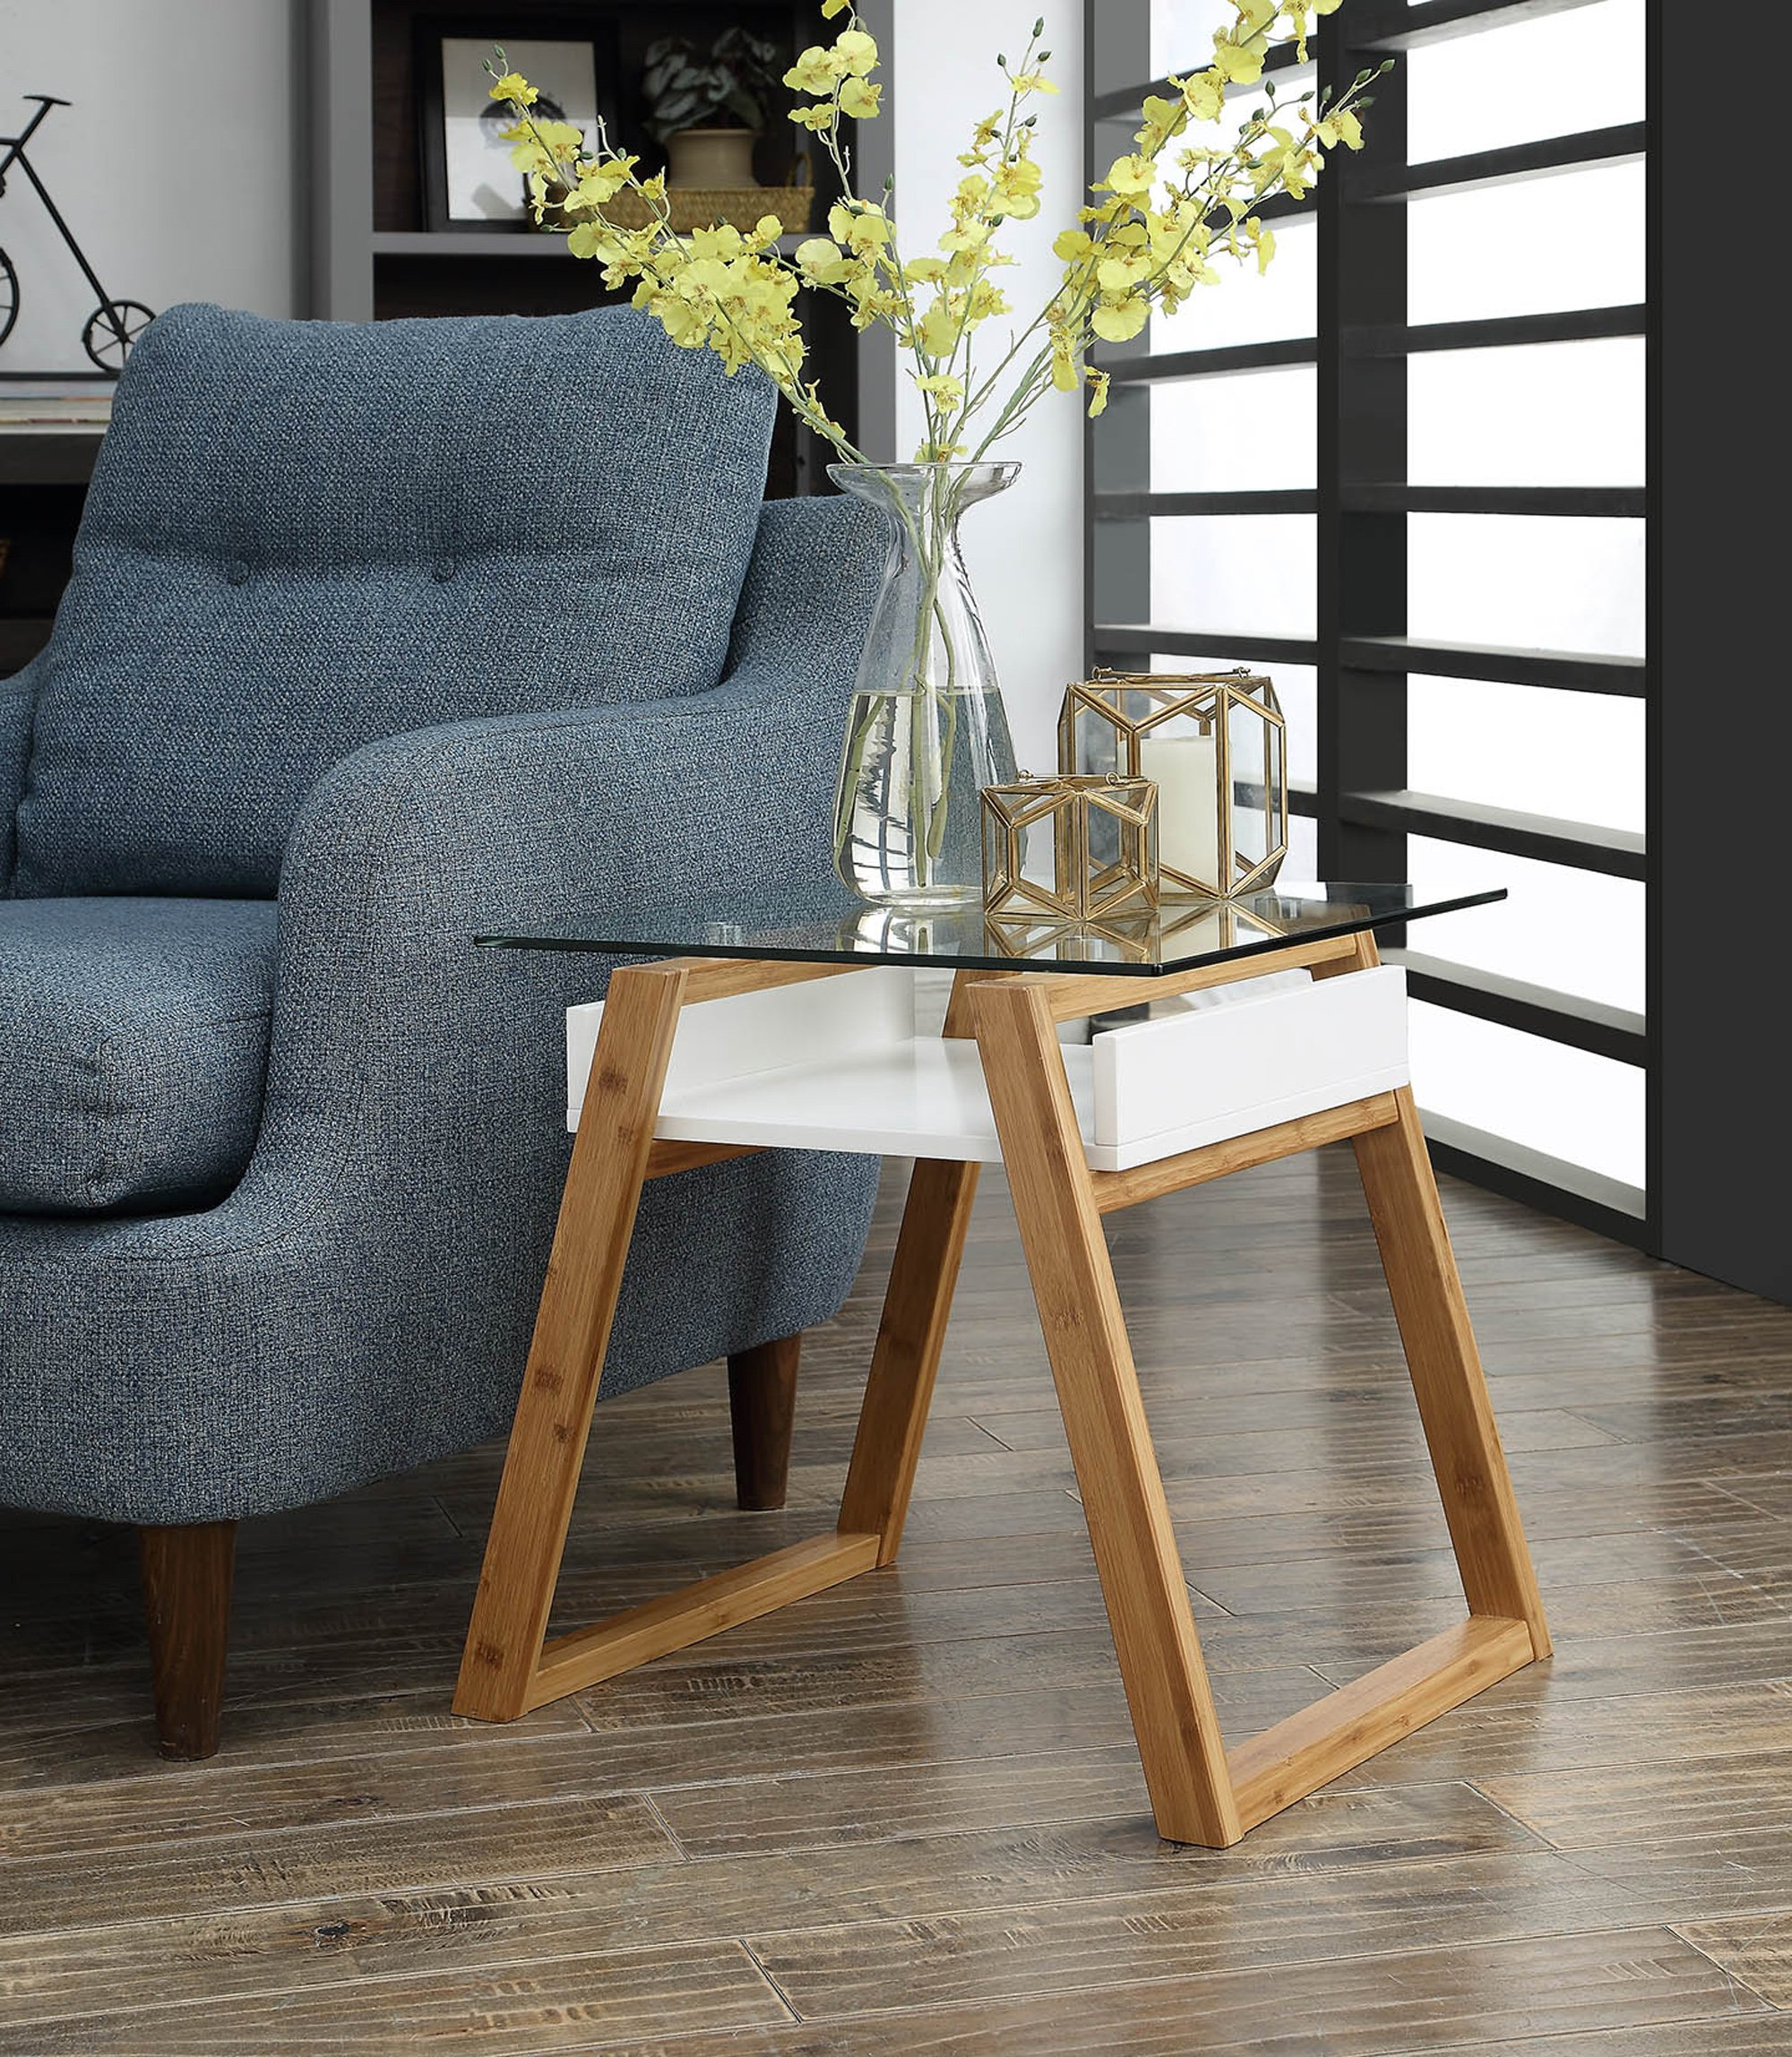 clear glass sofa end table shelf side chair narrow living room rh ebay com french side chairs for living room modern side chairs for living room